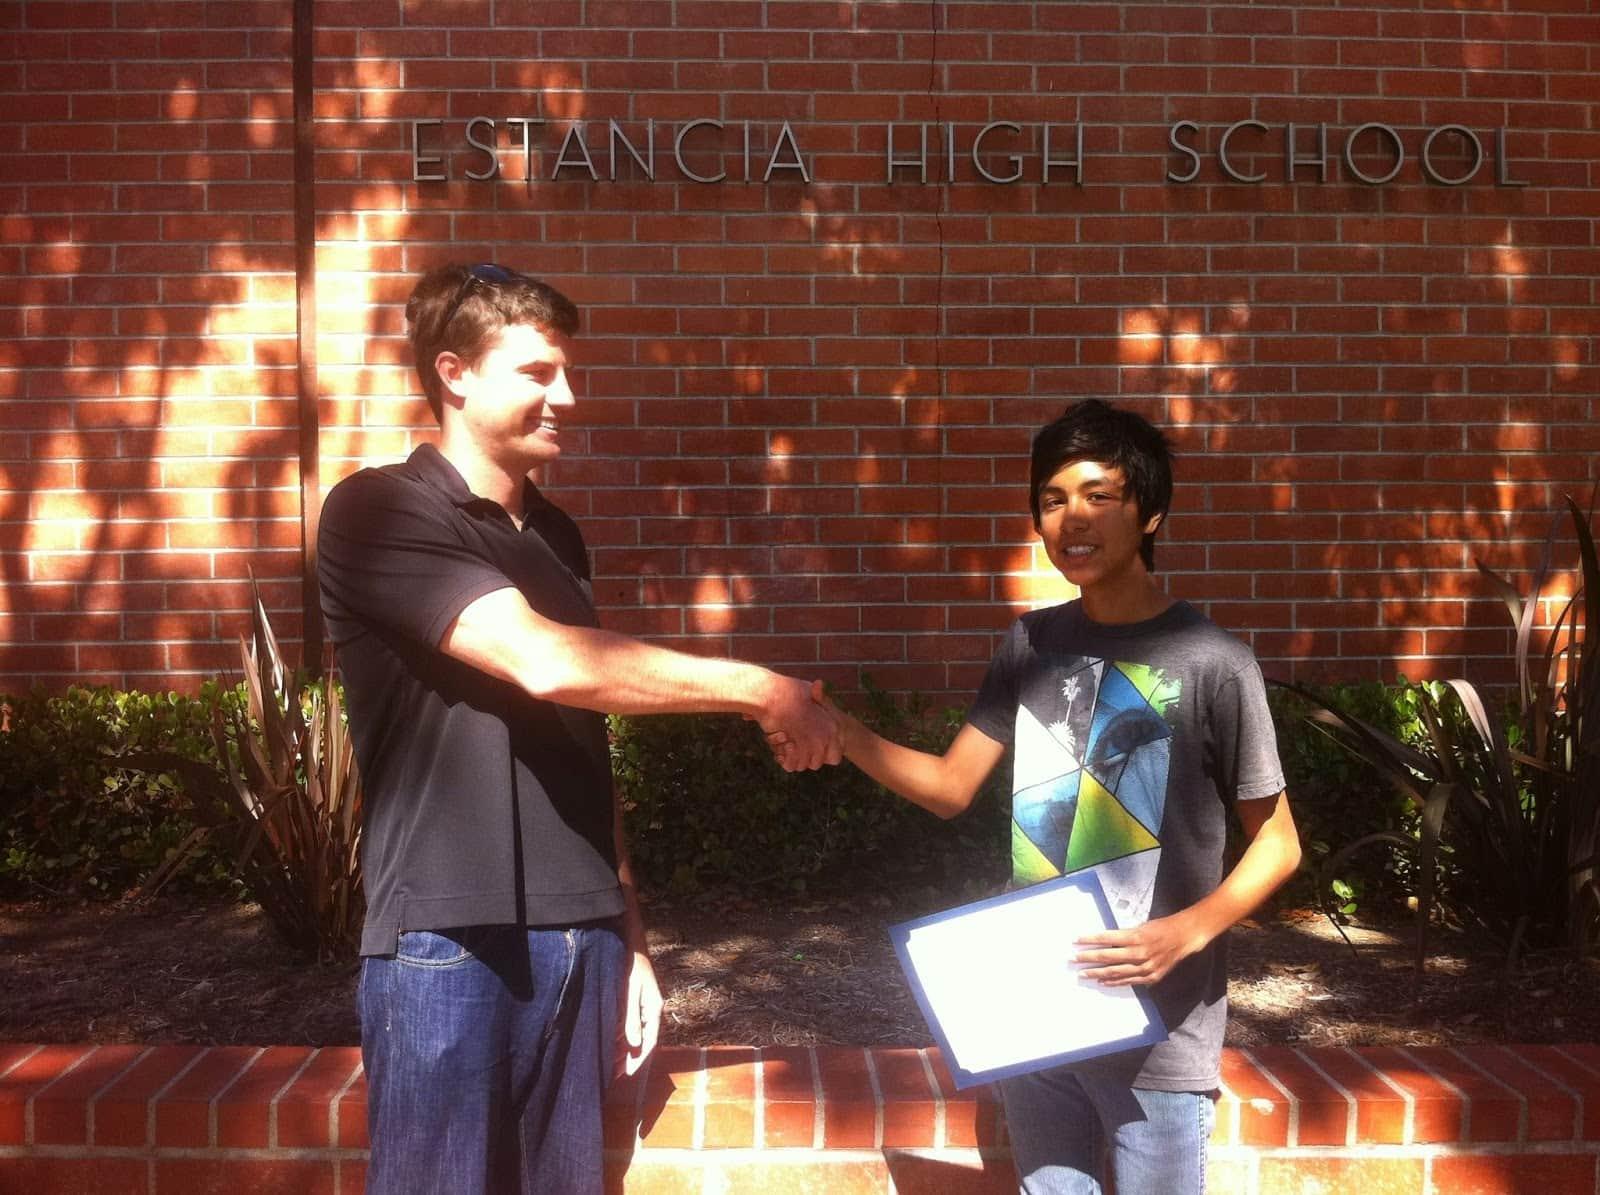 mark-tiner-memorial-scholarship-2011